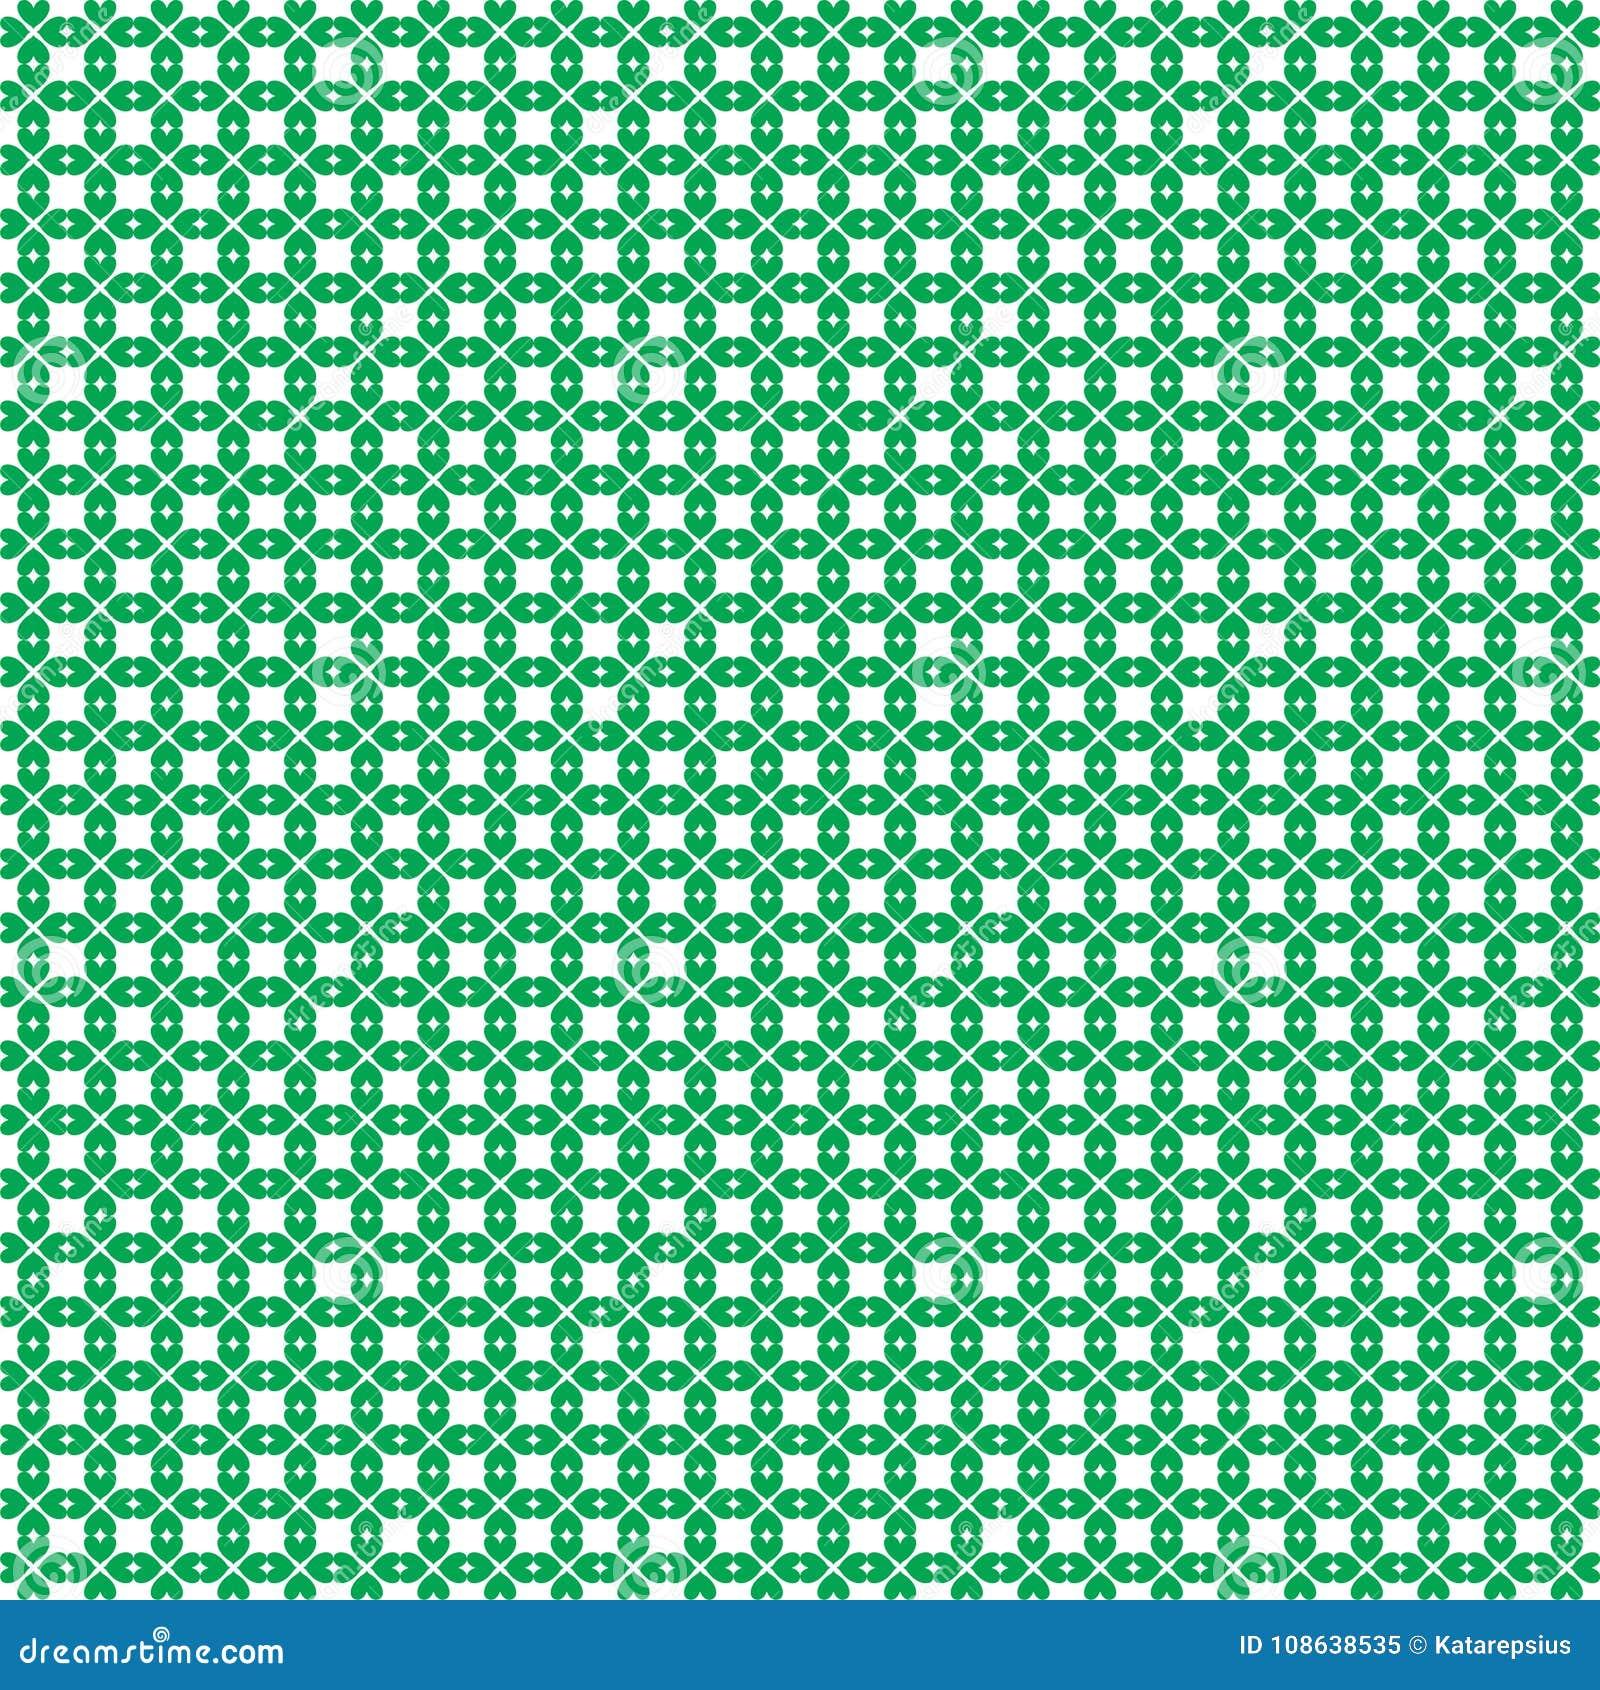 St Patricks Day Seamless Wallpaper With Shamrocks Print On ...